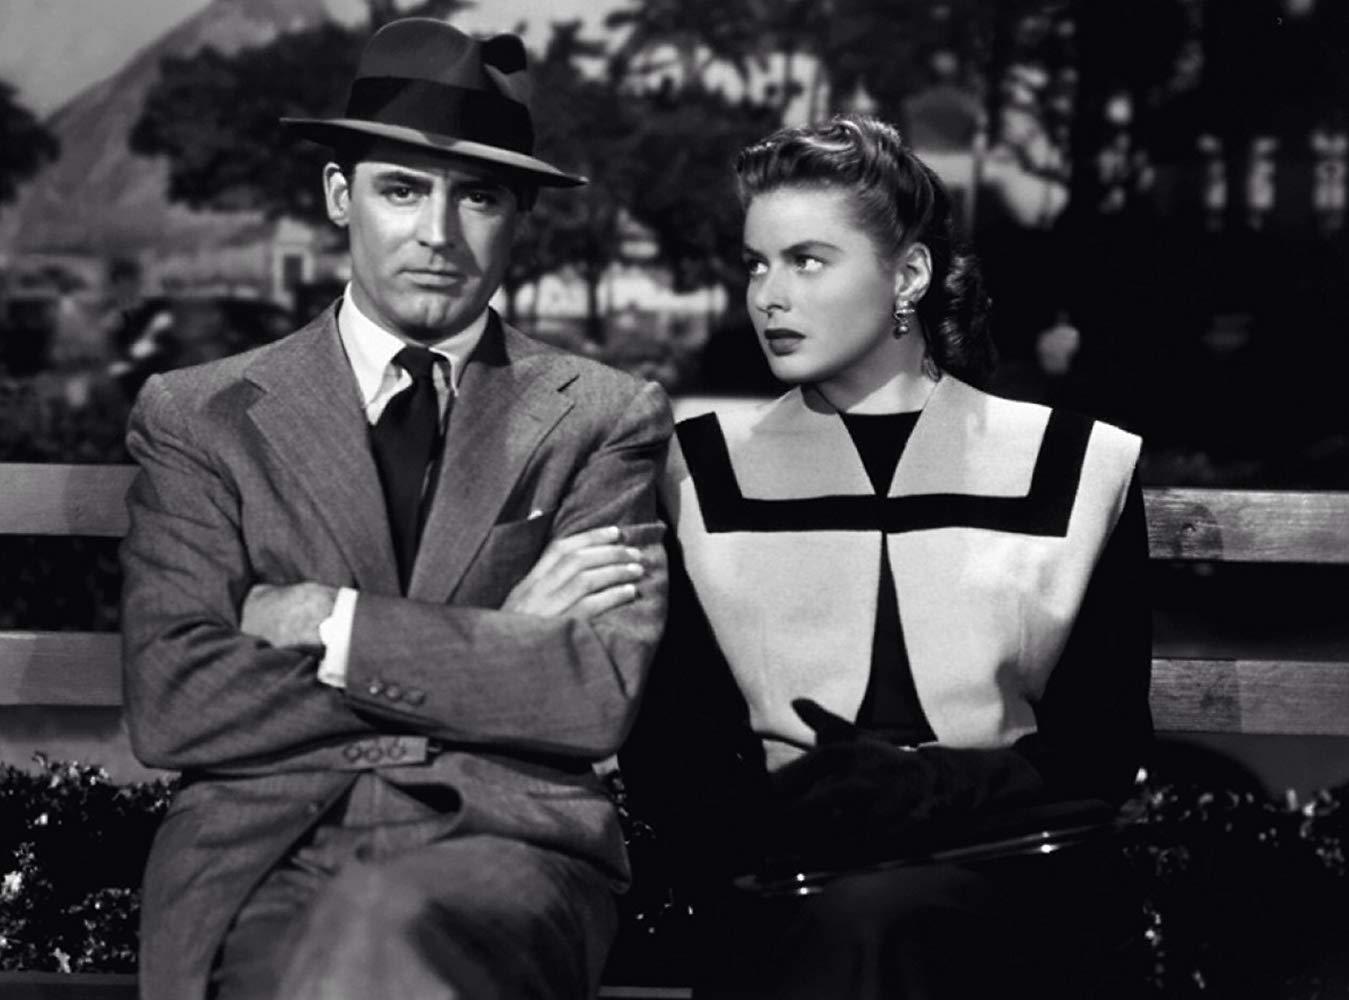 Notorious 1946ertyert - 10 فیلم برتر و شاهکار آلفرد هیچکاک بر اساس امتیاز IMDb